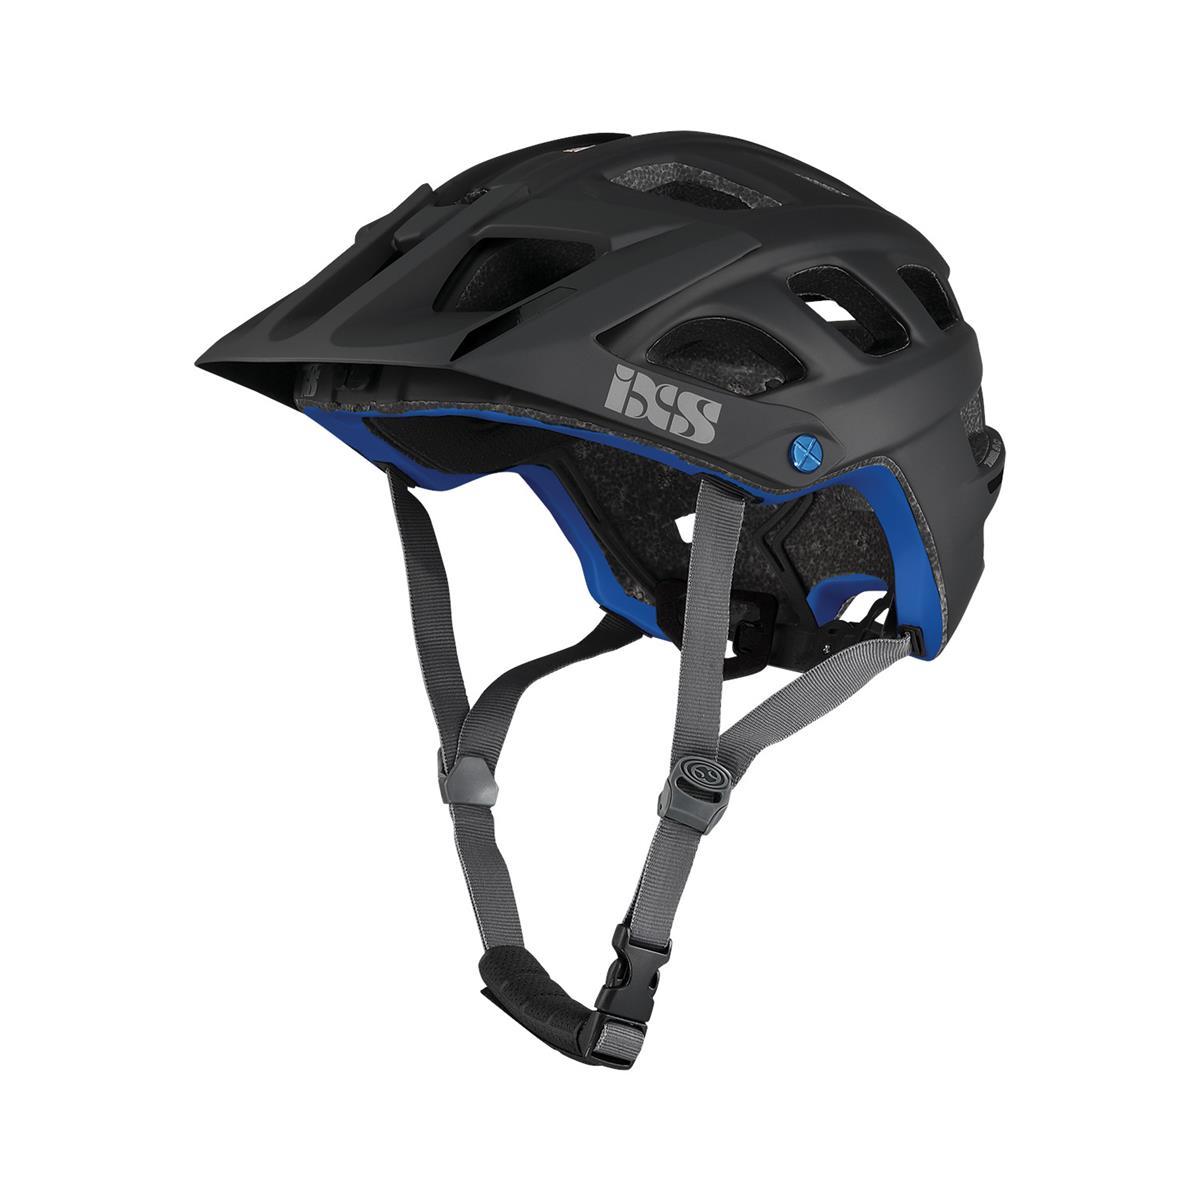 Casco Enduro Trail Evo E-Bike Edition Nero Taglia XS/S (49-54cm)